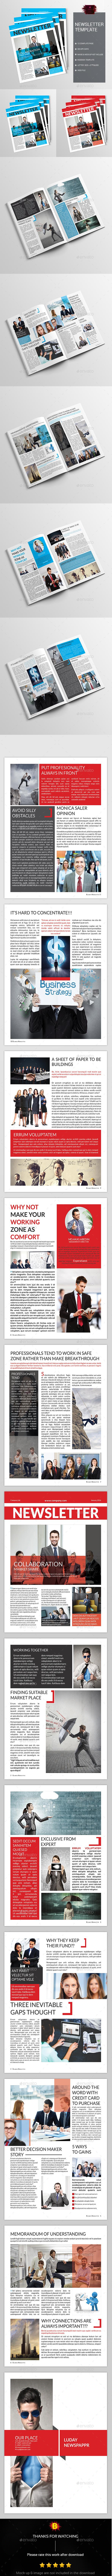 #Newsletter Template - Newsletters Print Templates.Download here: http://graphicriver.net/item/newsletter-template/16432185?ref=arroganttype